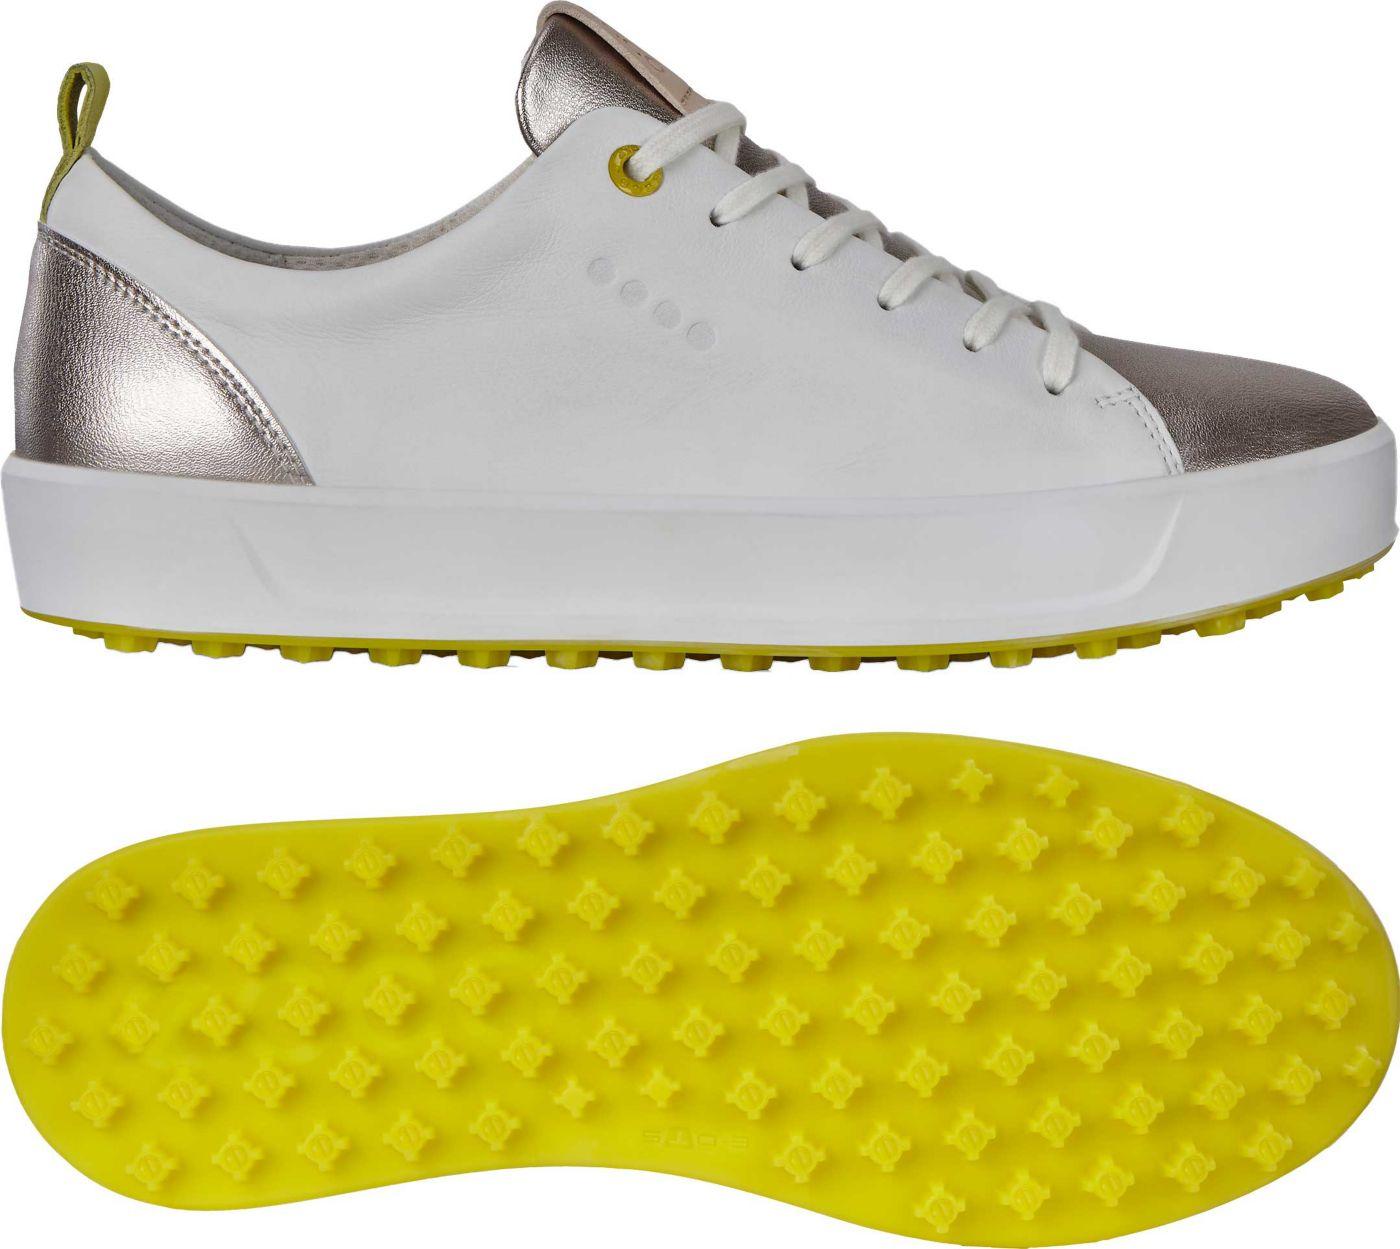 ECCO Women's Soft Golf Shoes